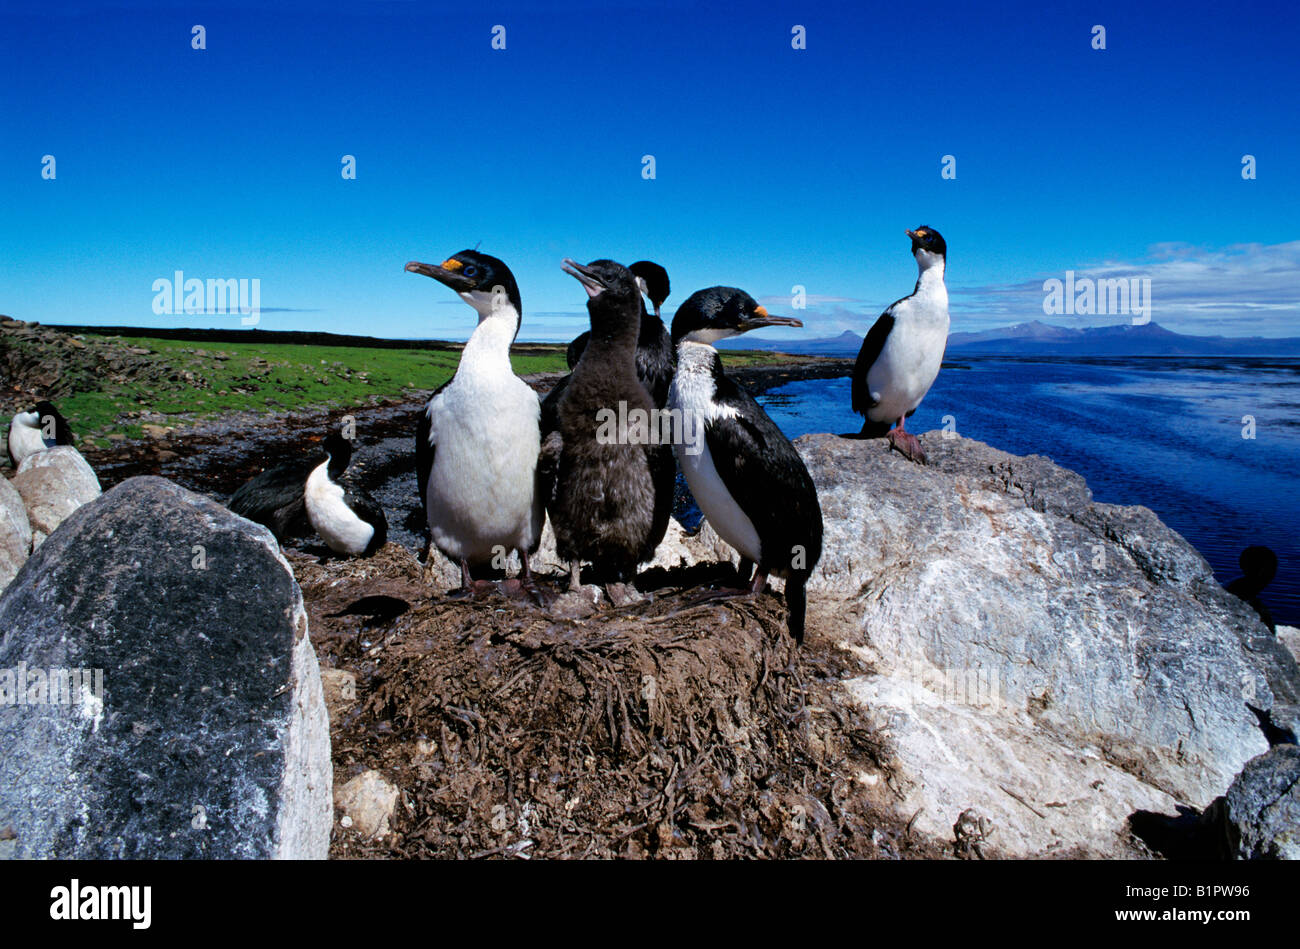 cormoran kerguelen imperial Shag aka Blue eyed Shag Phalacrocorax atriceps on nest America American animal animals - Stock Image